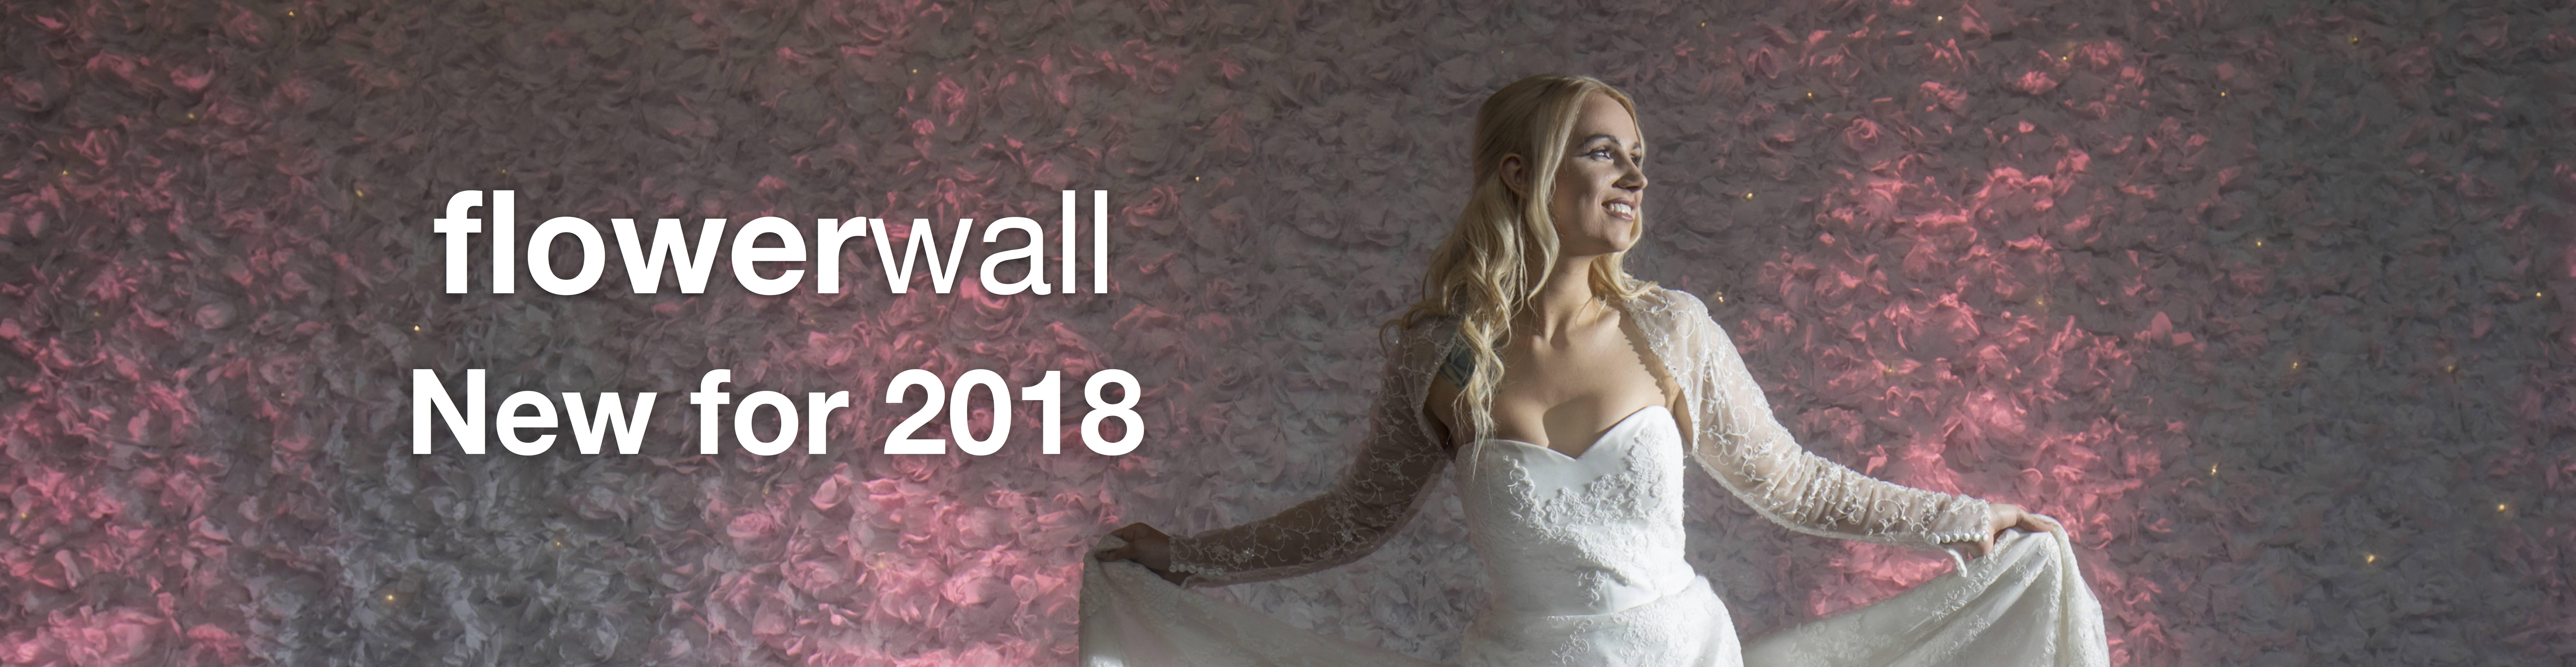 Flowerwall-Header